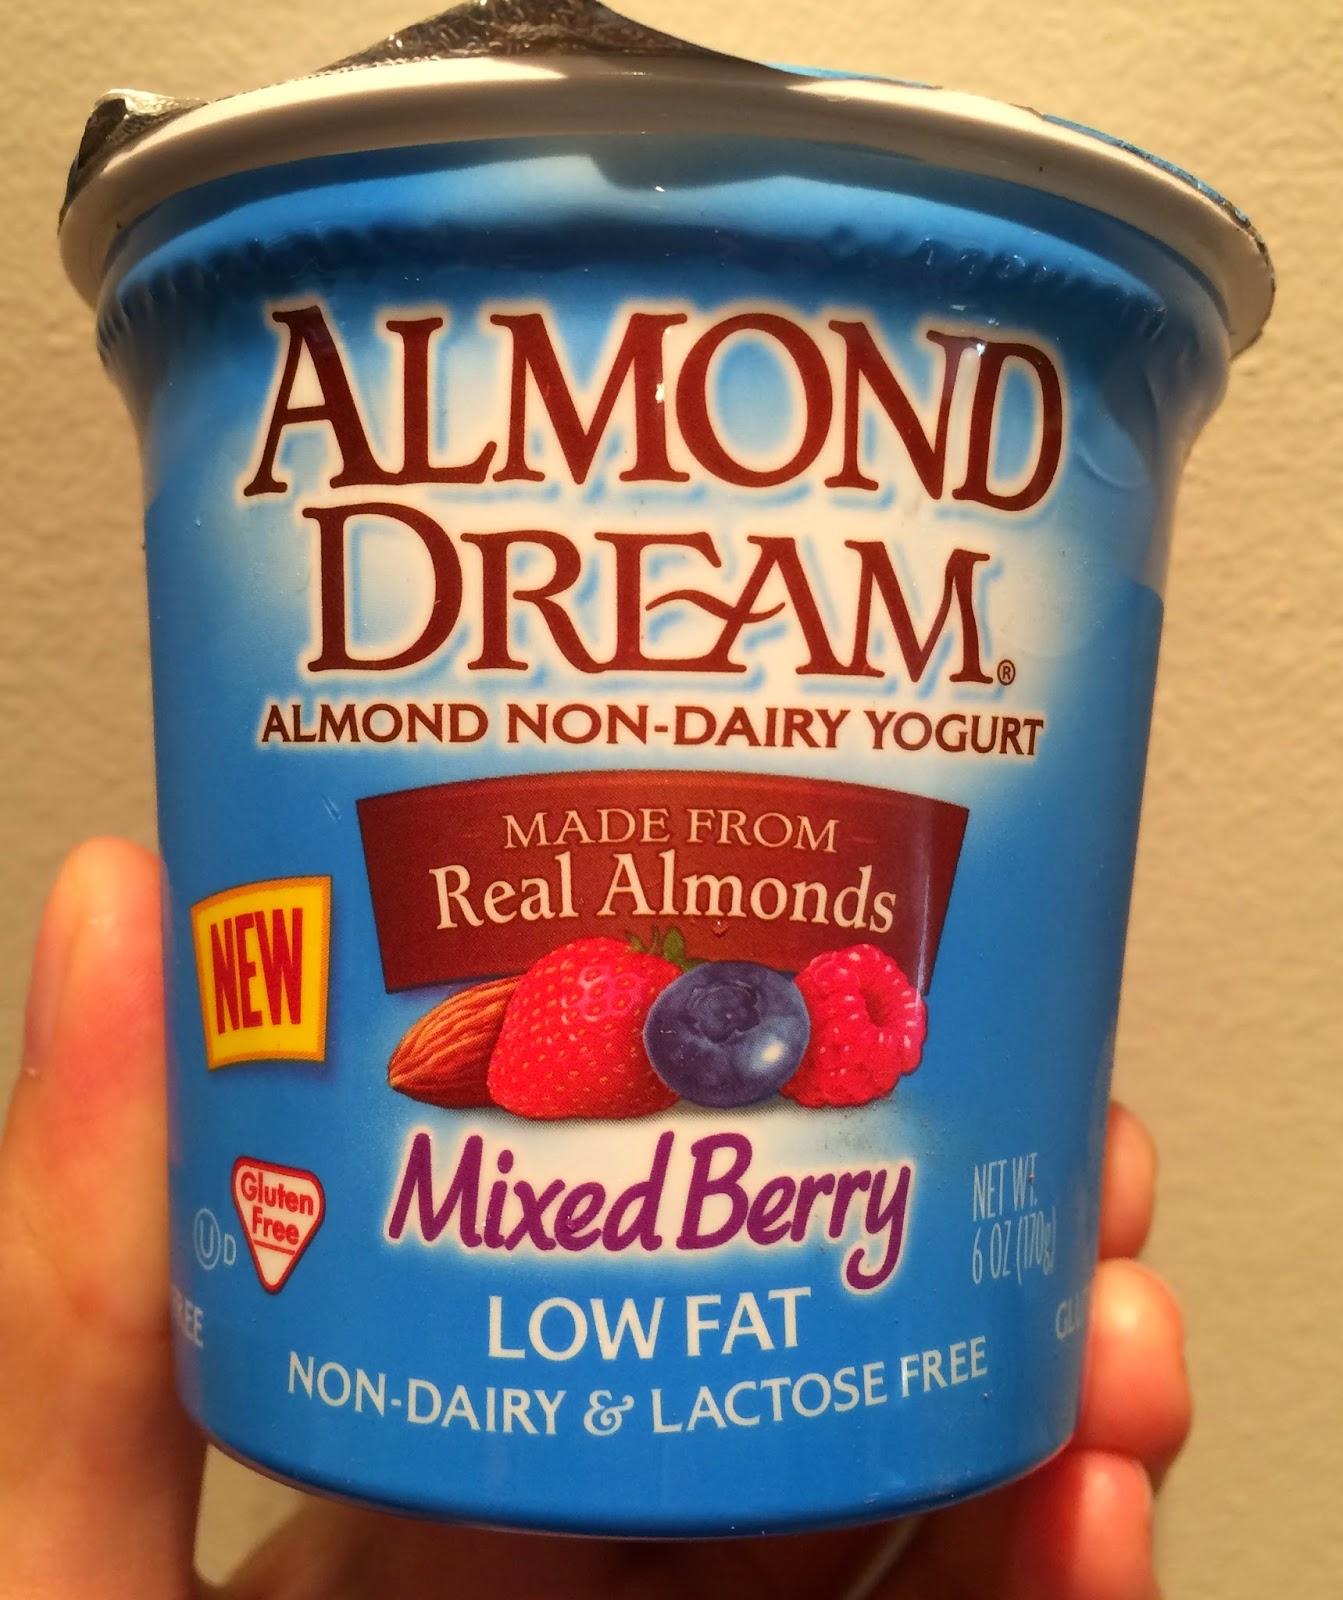 Almond Dream Yogurt Mixed Berry アーモンド ドリーム ヨーグルトミックス